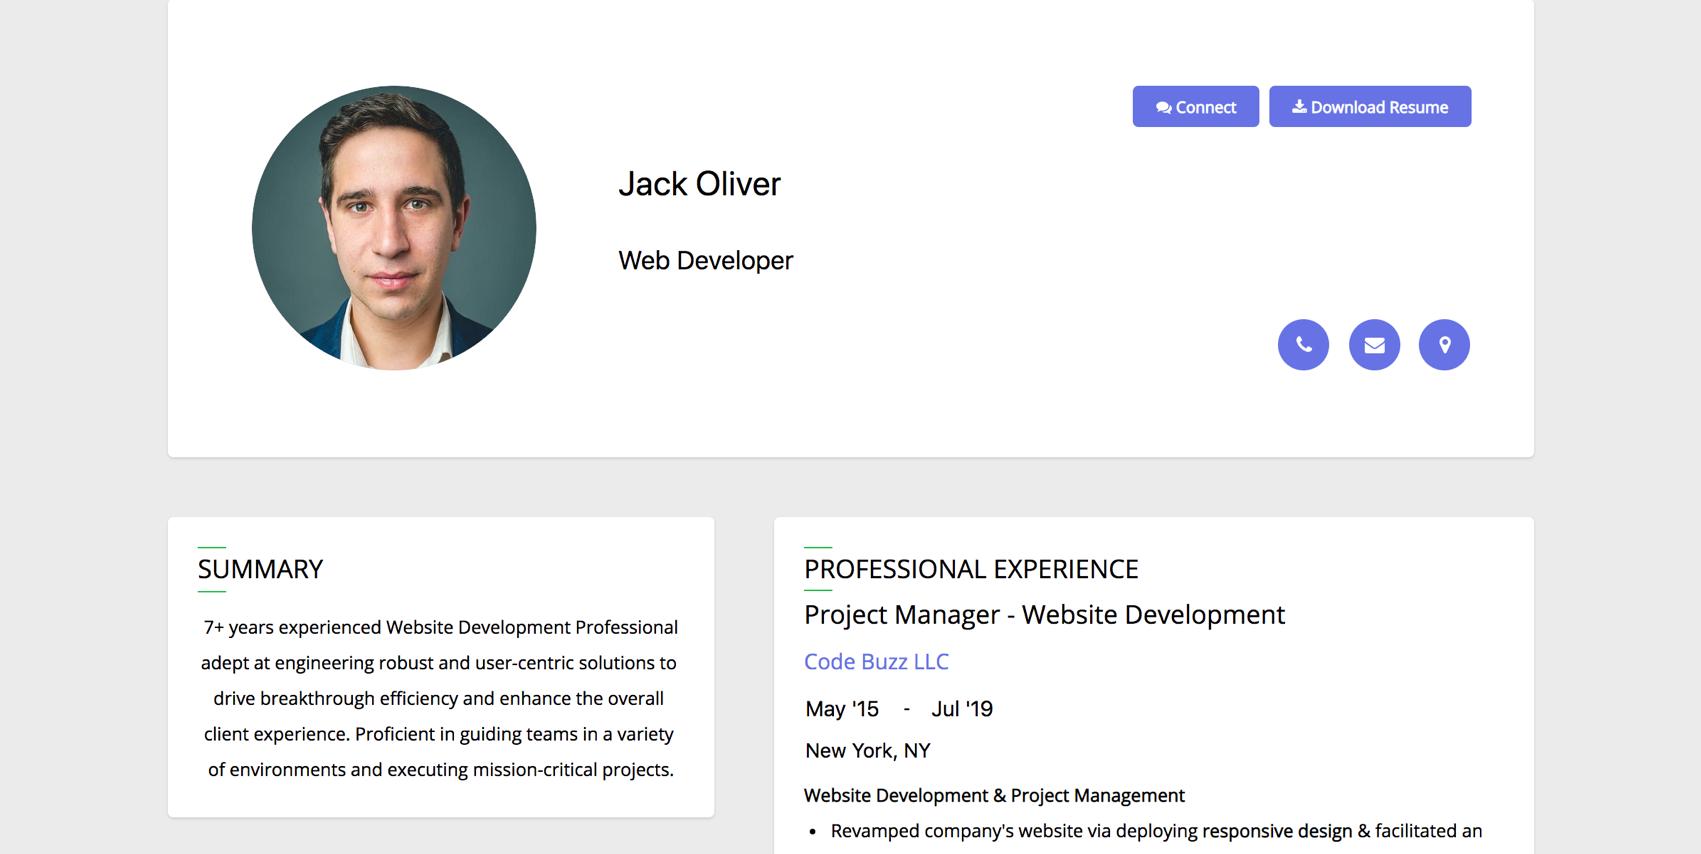 https://d31kzl7c7thvlu.cloudfront.net/template/H-Profile/h_profile.png